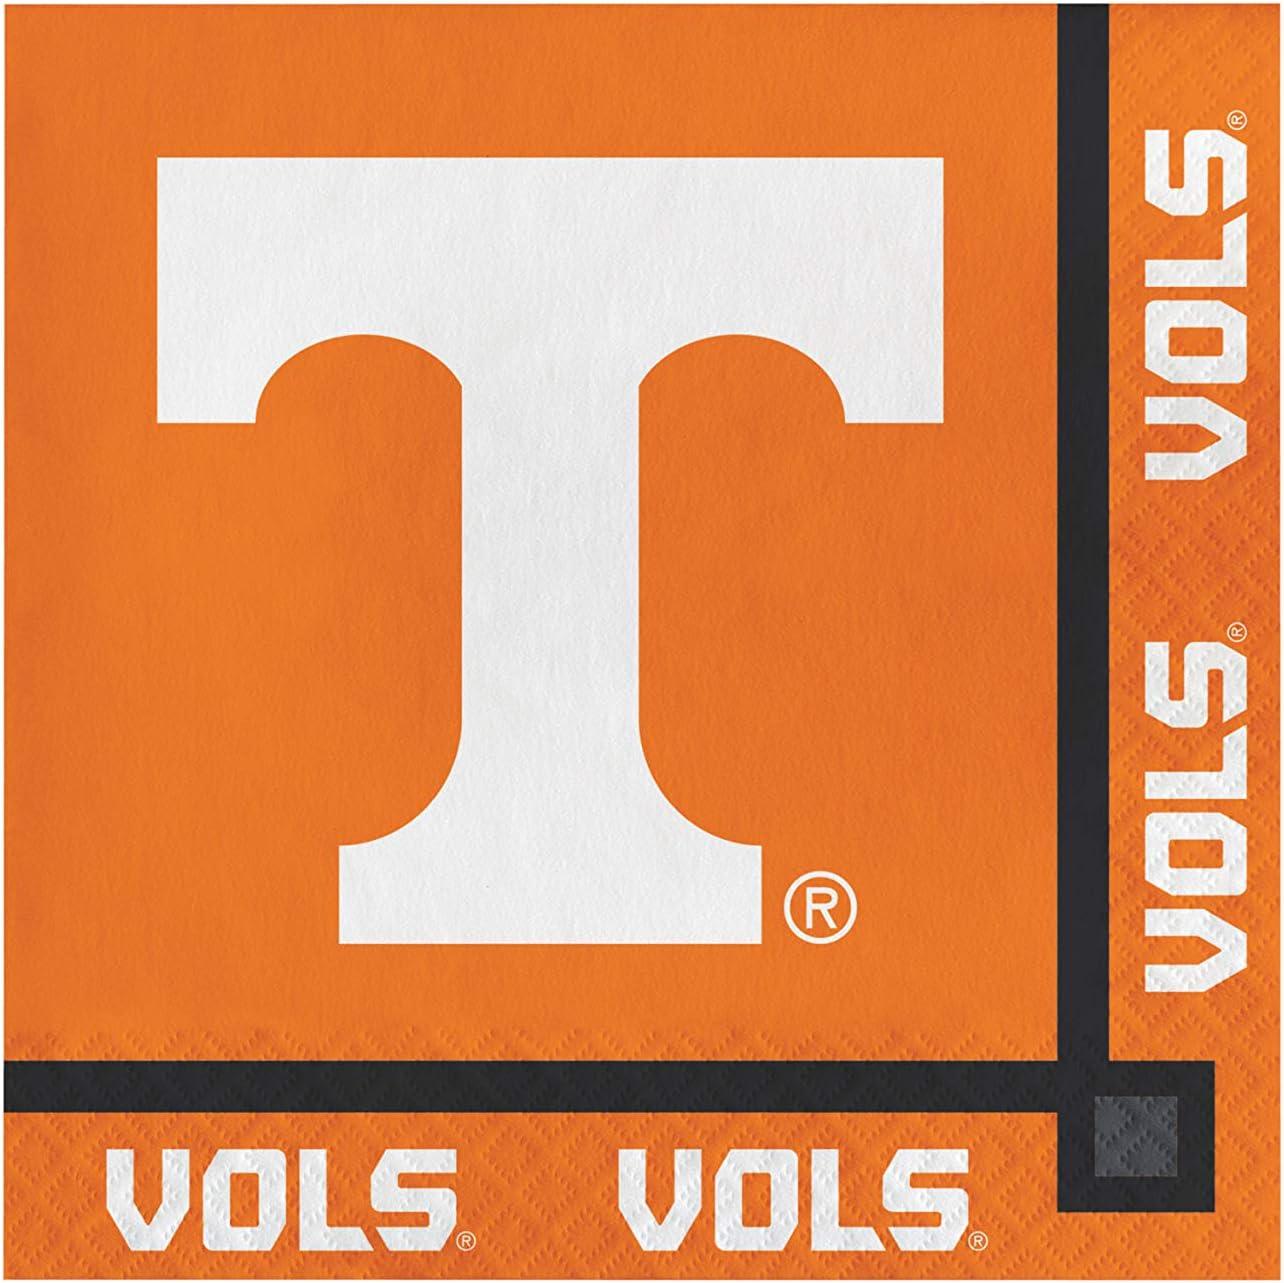 Creative Converting Beverage University of Tennesse Knoxville Beverage Napkins-20pc, Beverage, Orange/White